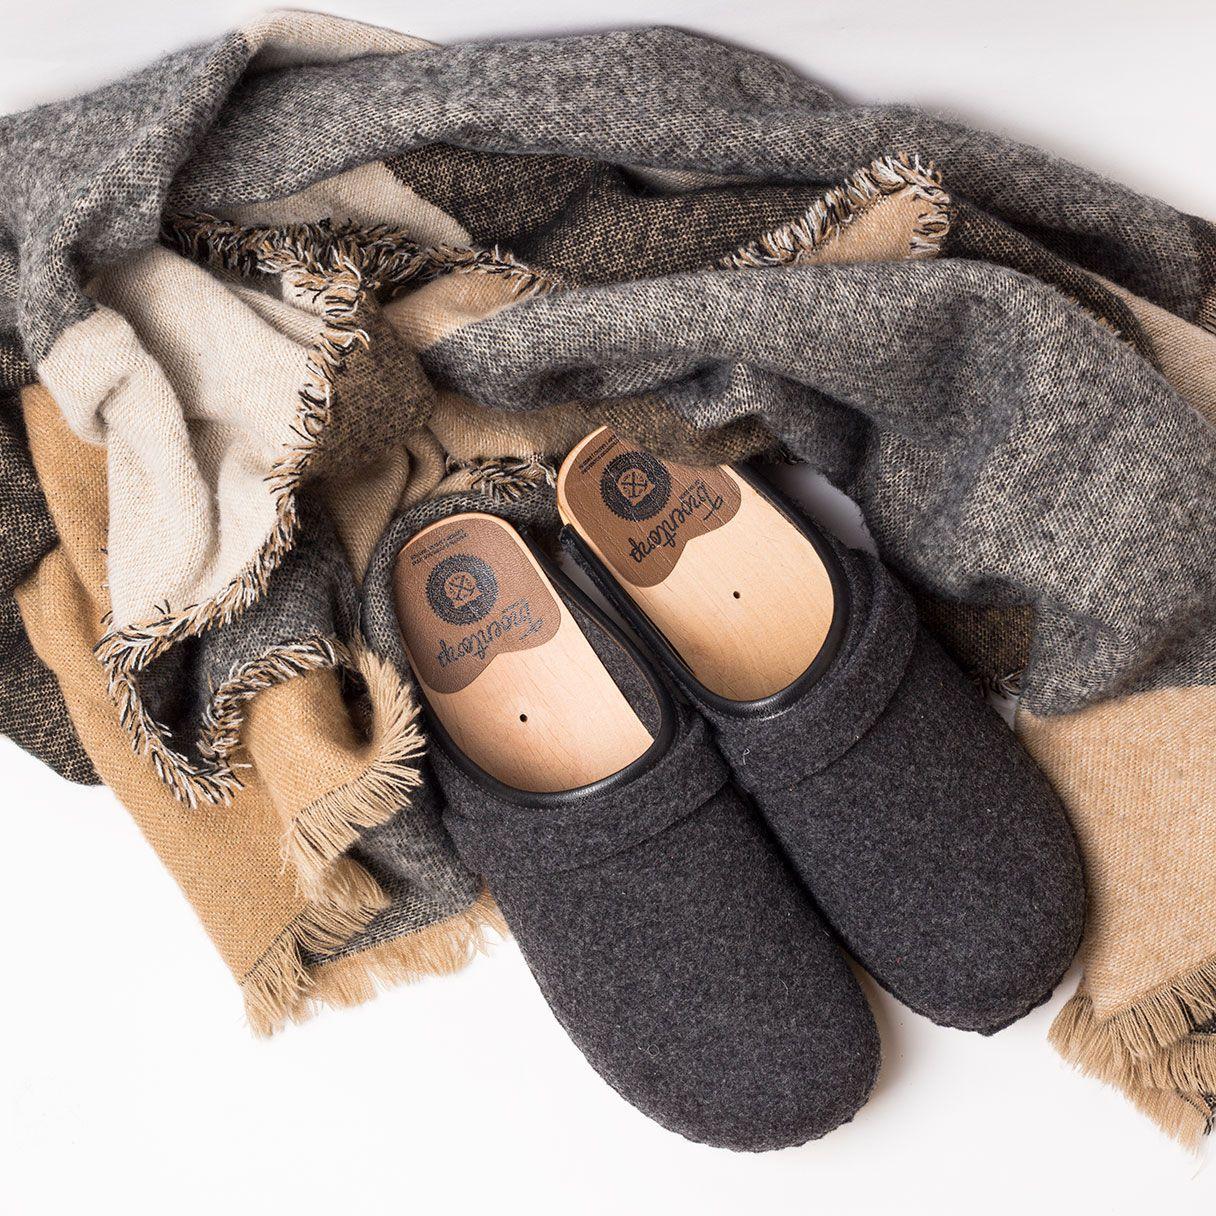 673c09d311d4 Swedish clog style in grey wool felt from Troentorp Clogs